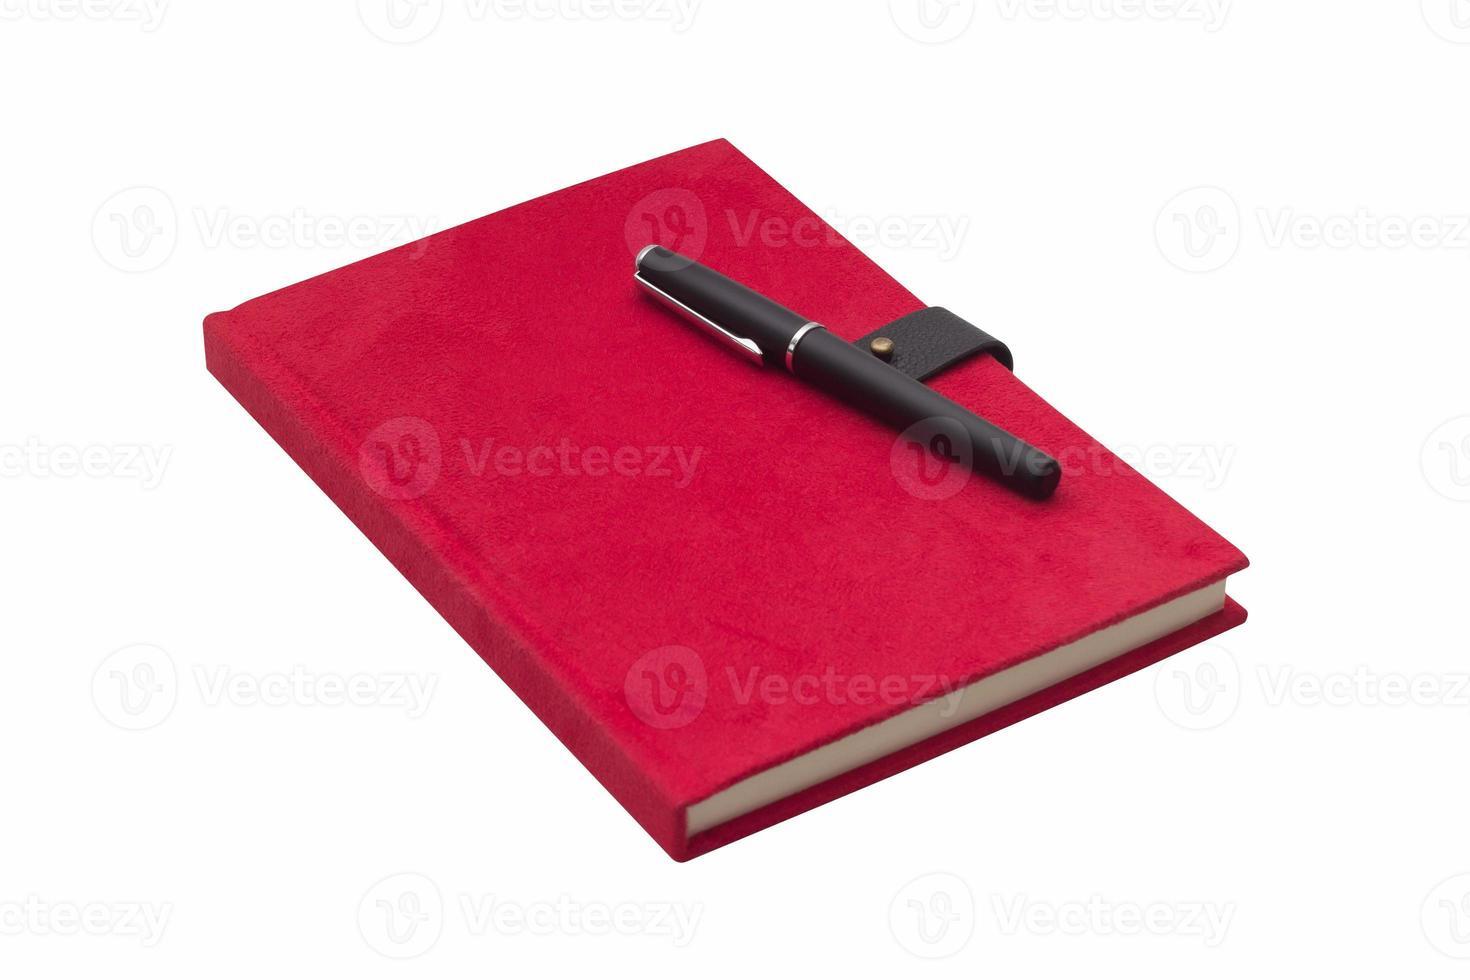 leeres rotes Hardcover-Notizbuch mit Stift isoliert foto